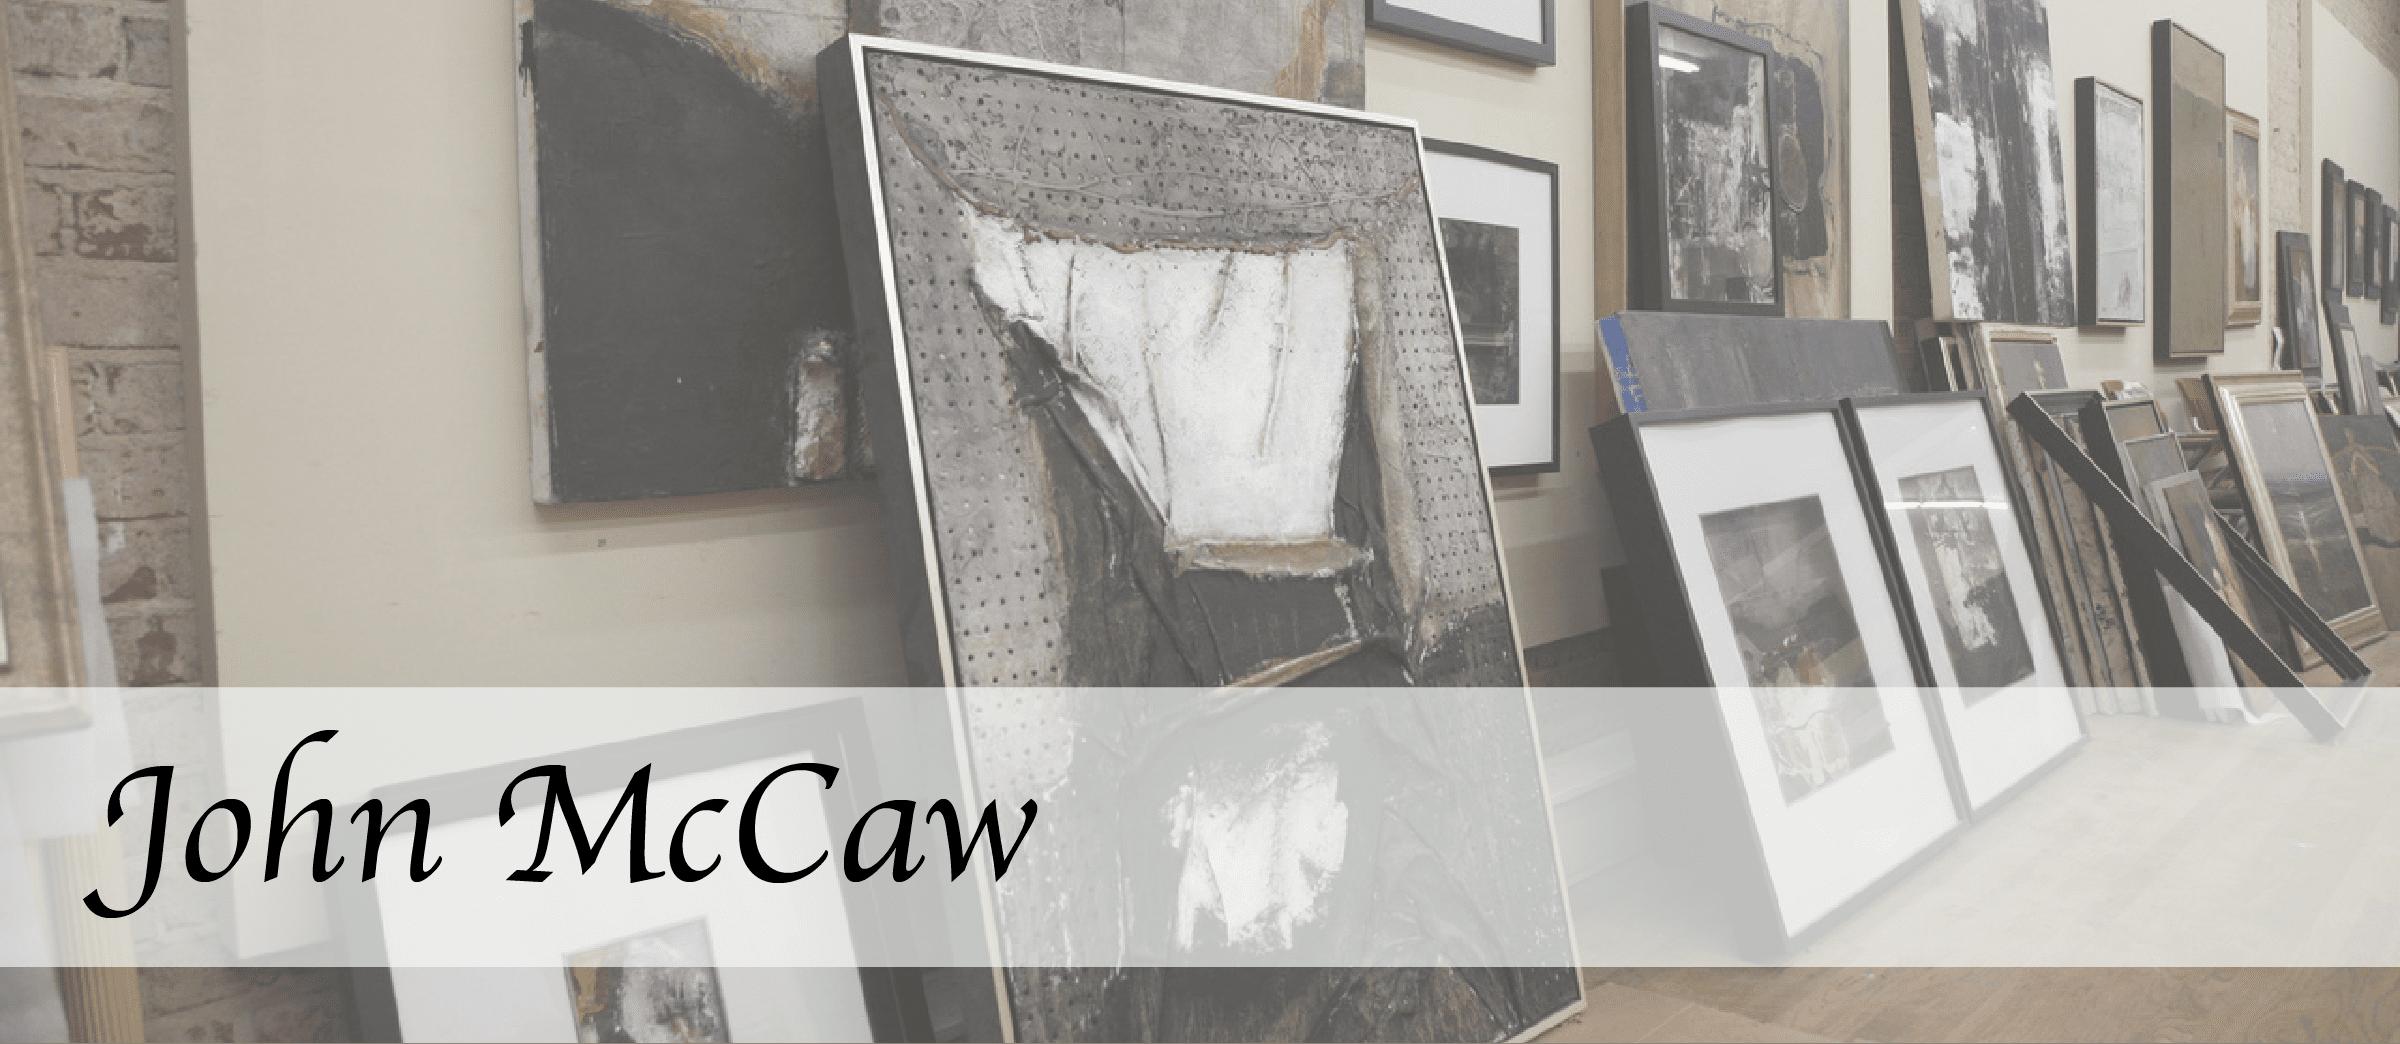 McCaw_John_Banner